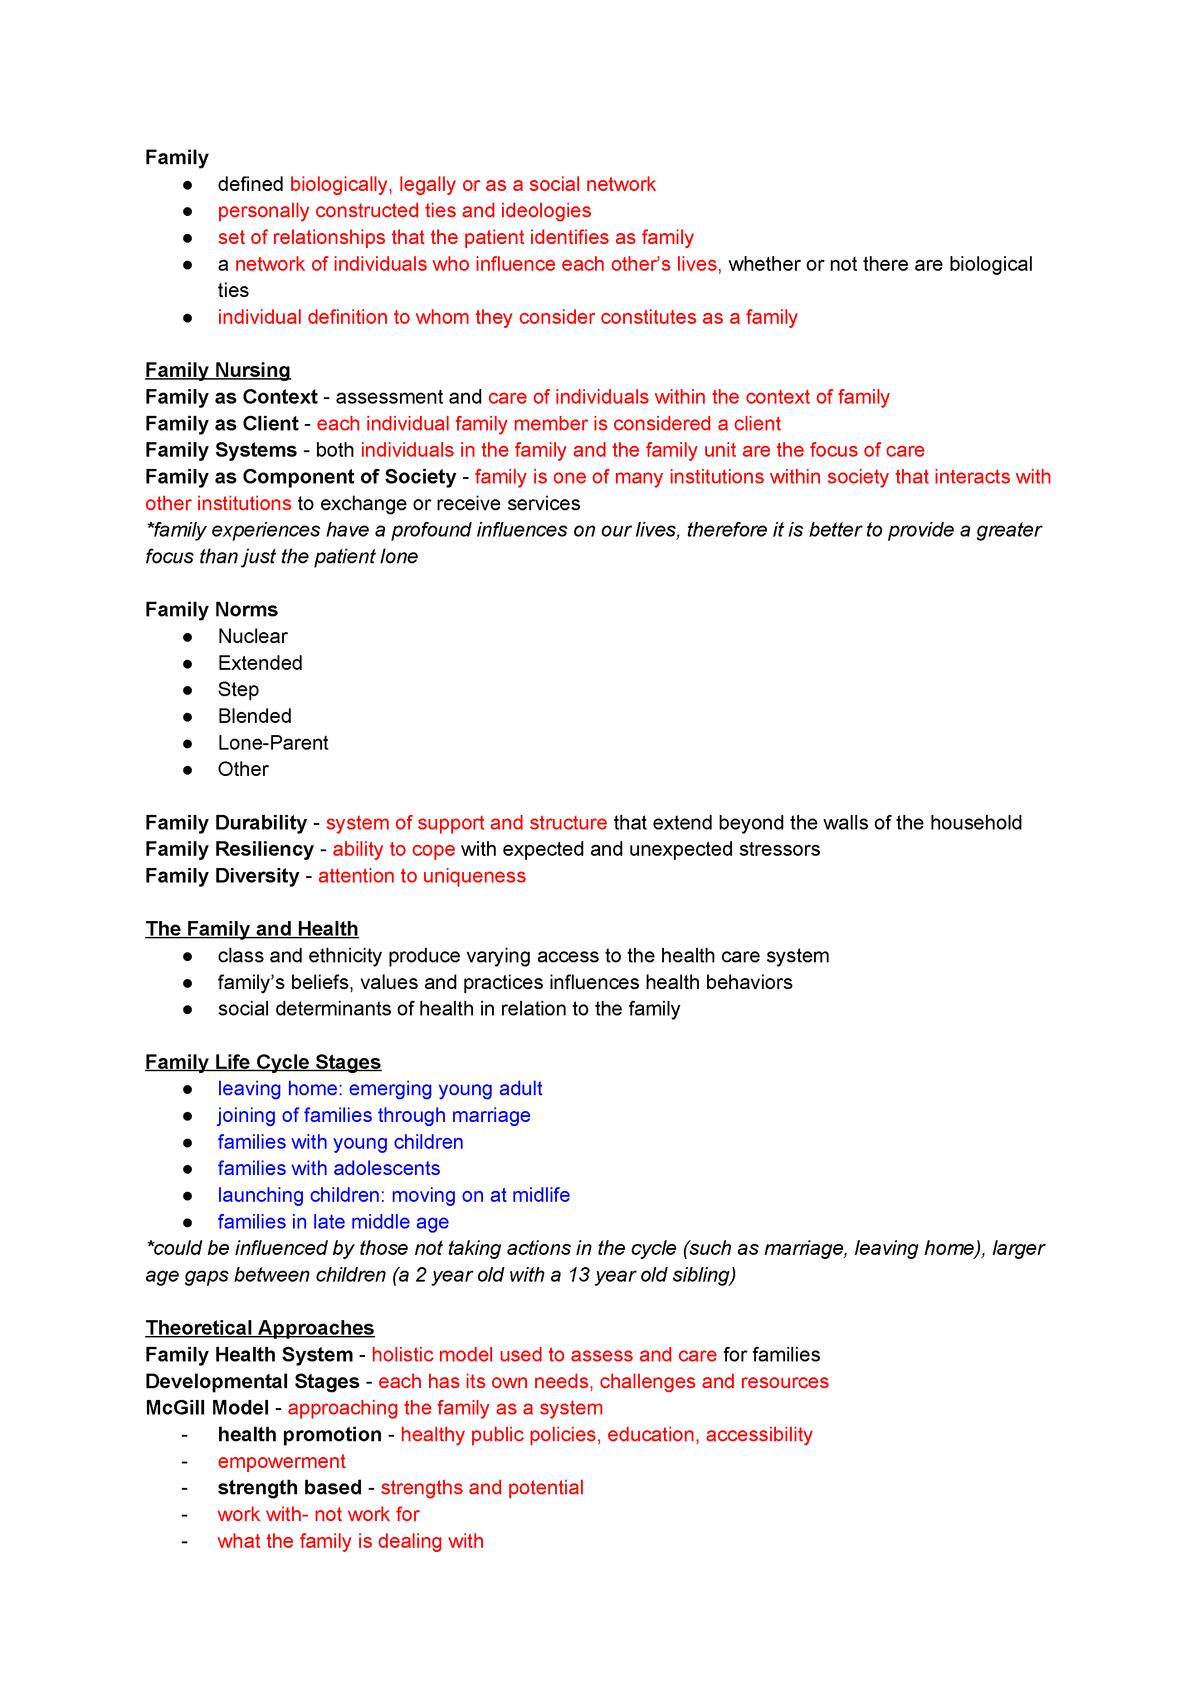 Week 5 - Family Nursing - Lecture notes 10 - NURS 124 - StuDocu